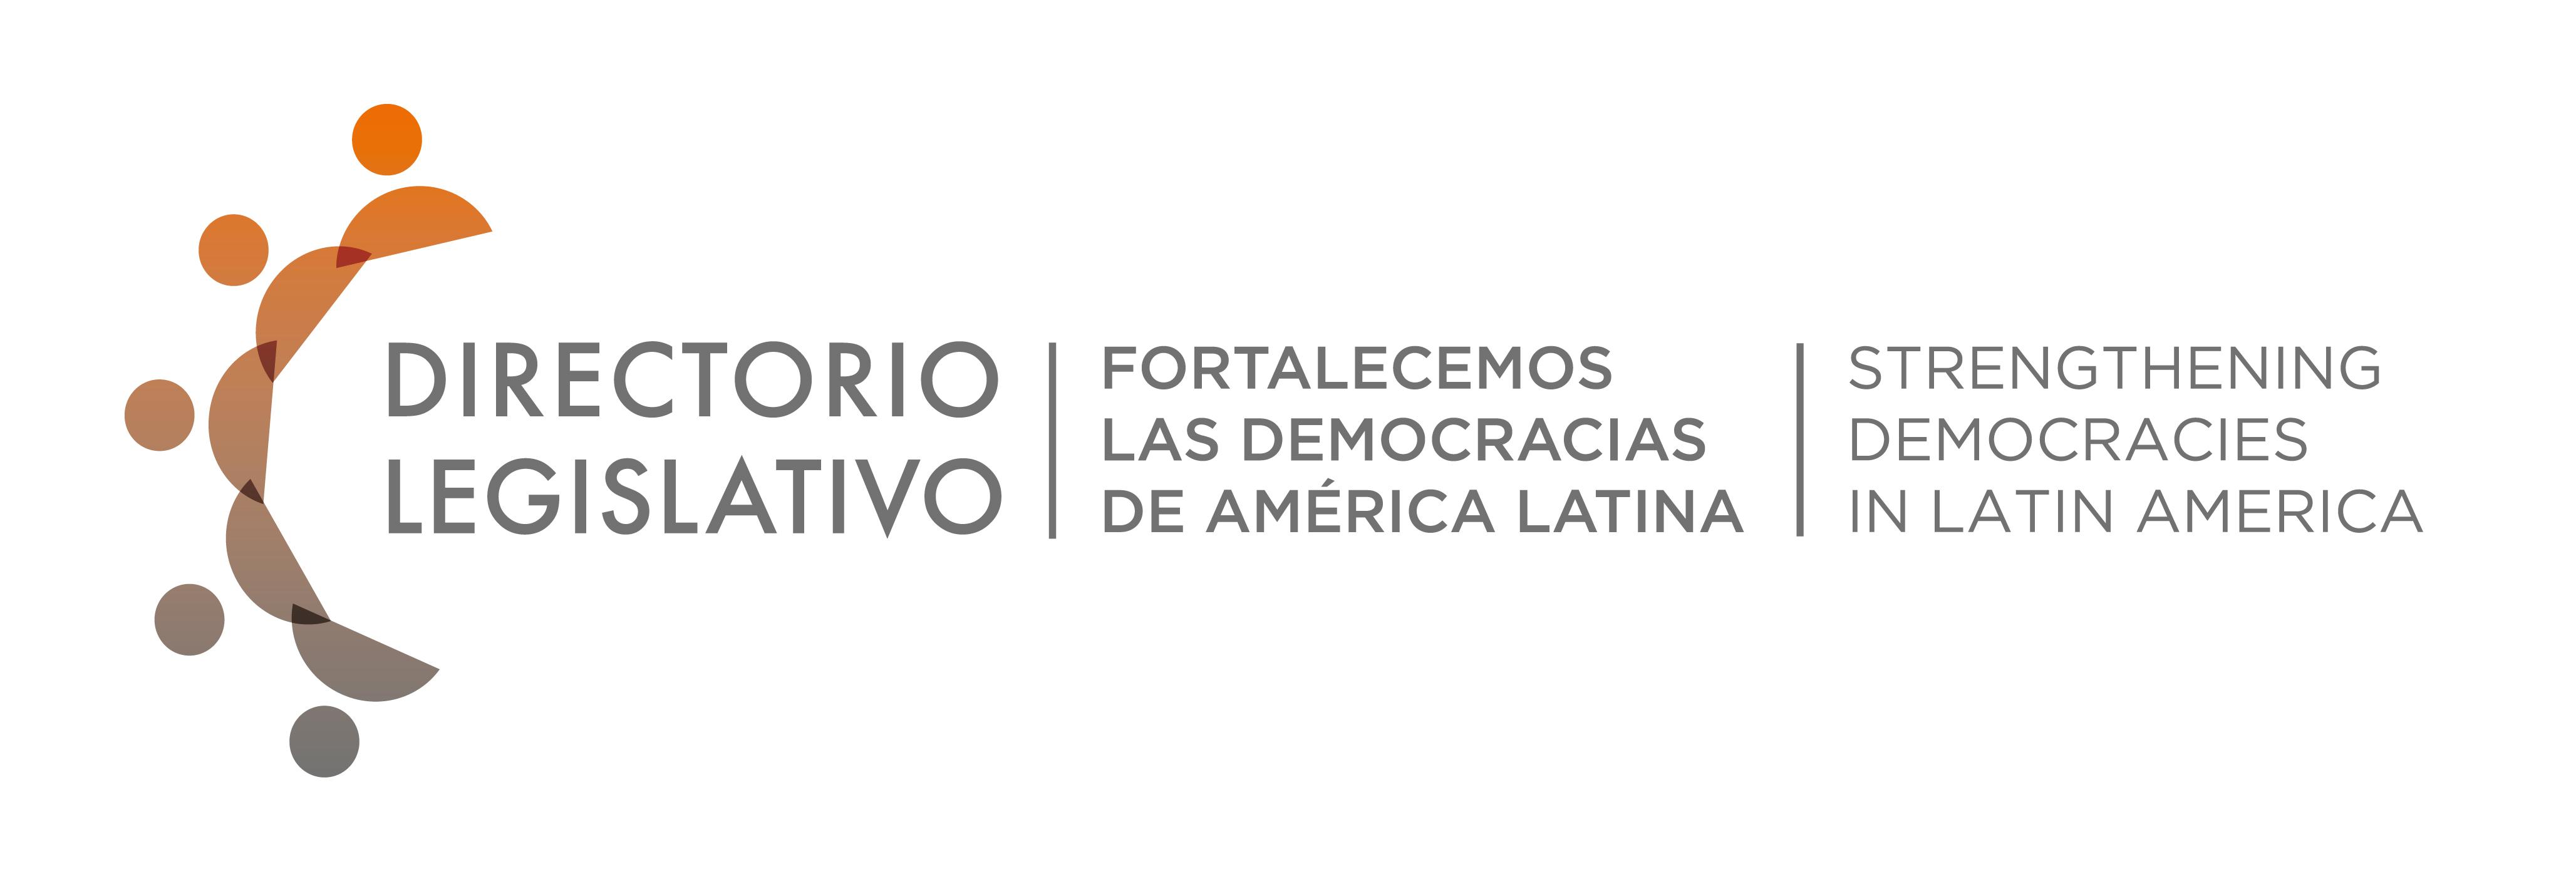 logo directorio legislativo